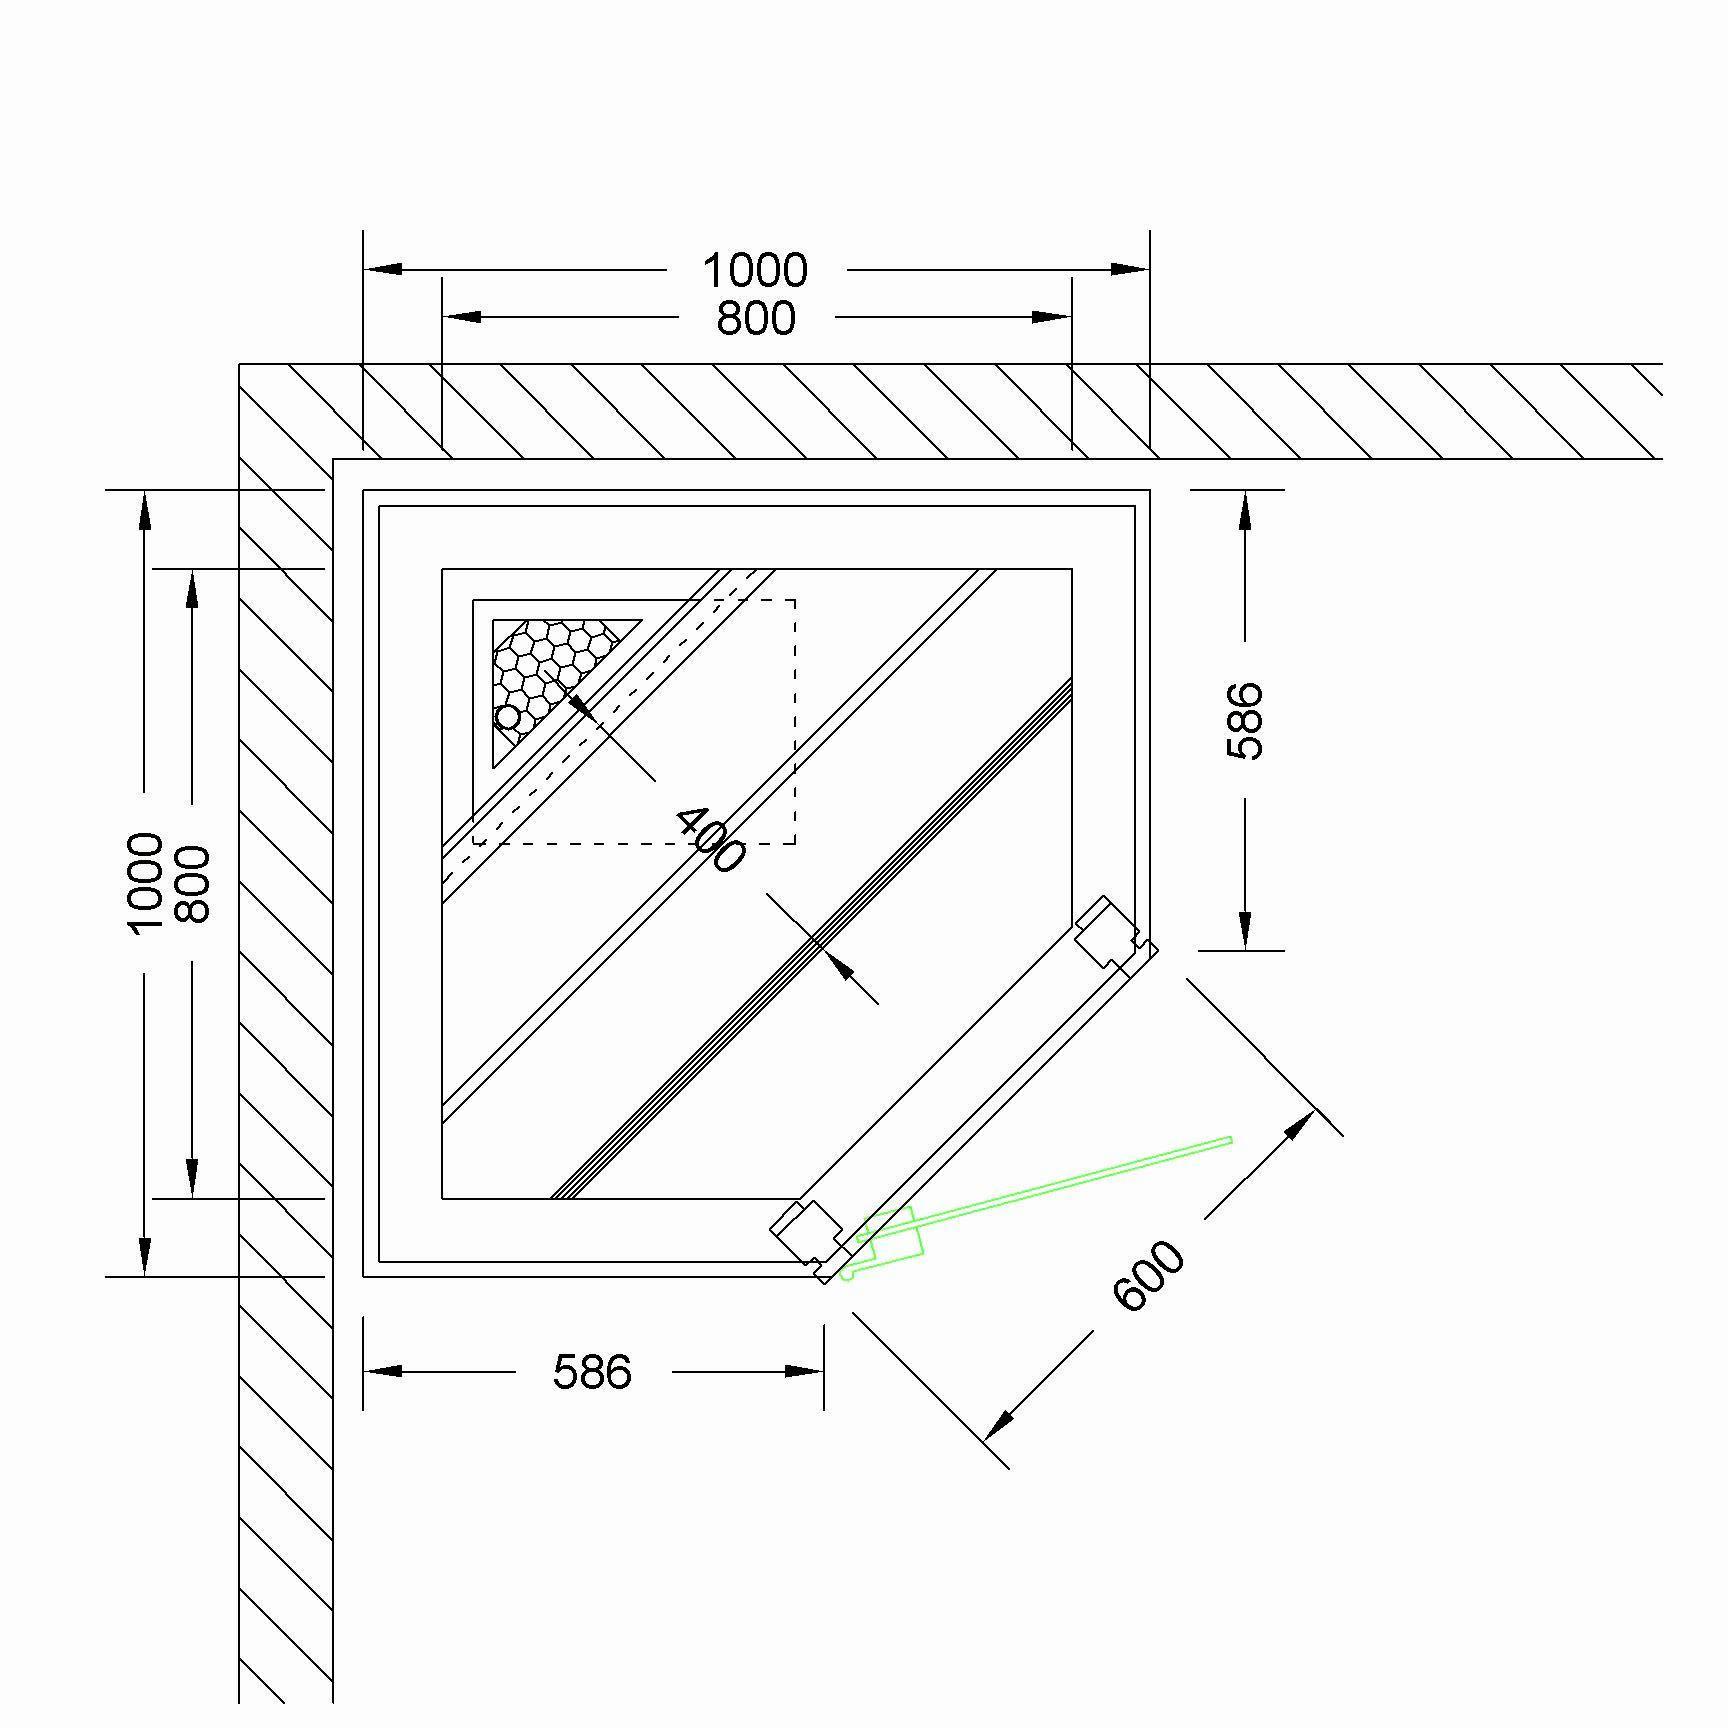 koll bad sauna 2010 preisliste saunabreite 100 koll. Black Bedroom Furniture Sets. Home Design Ideas